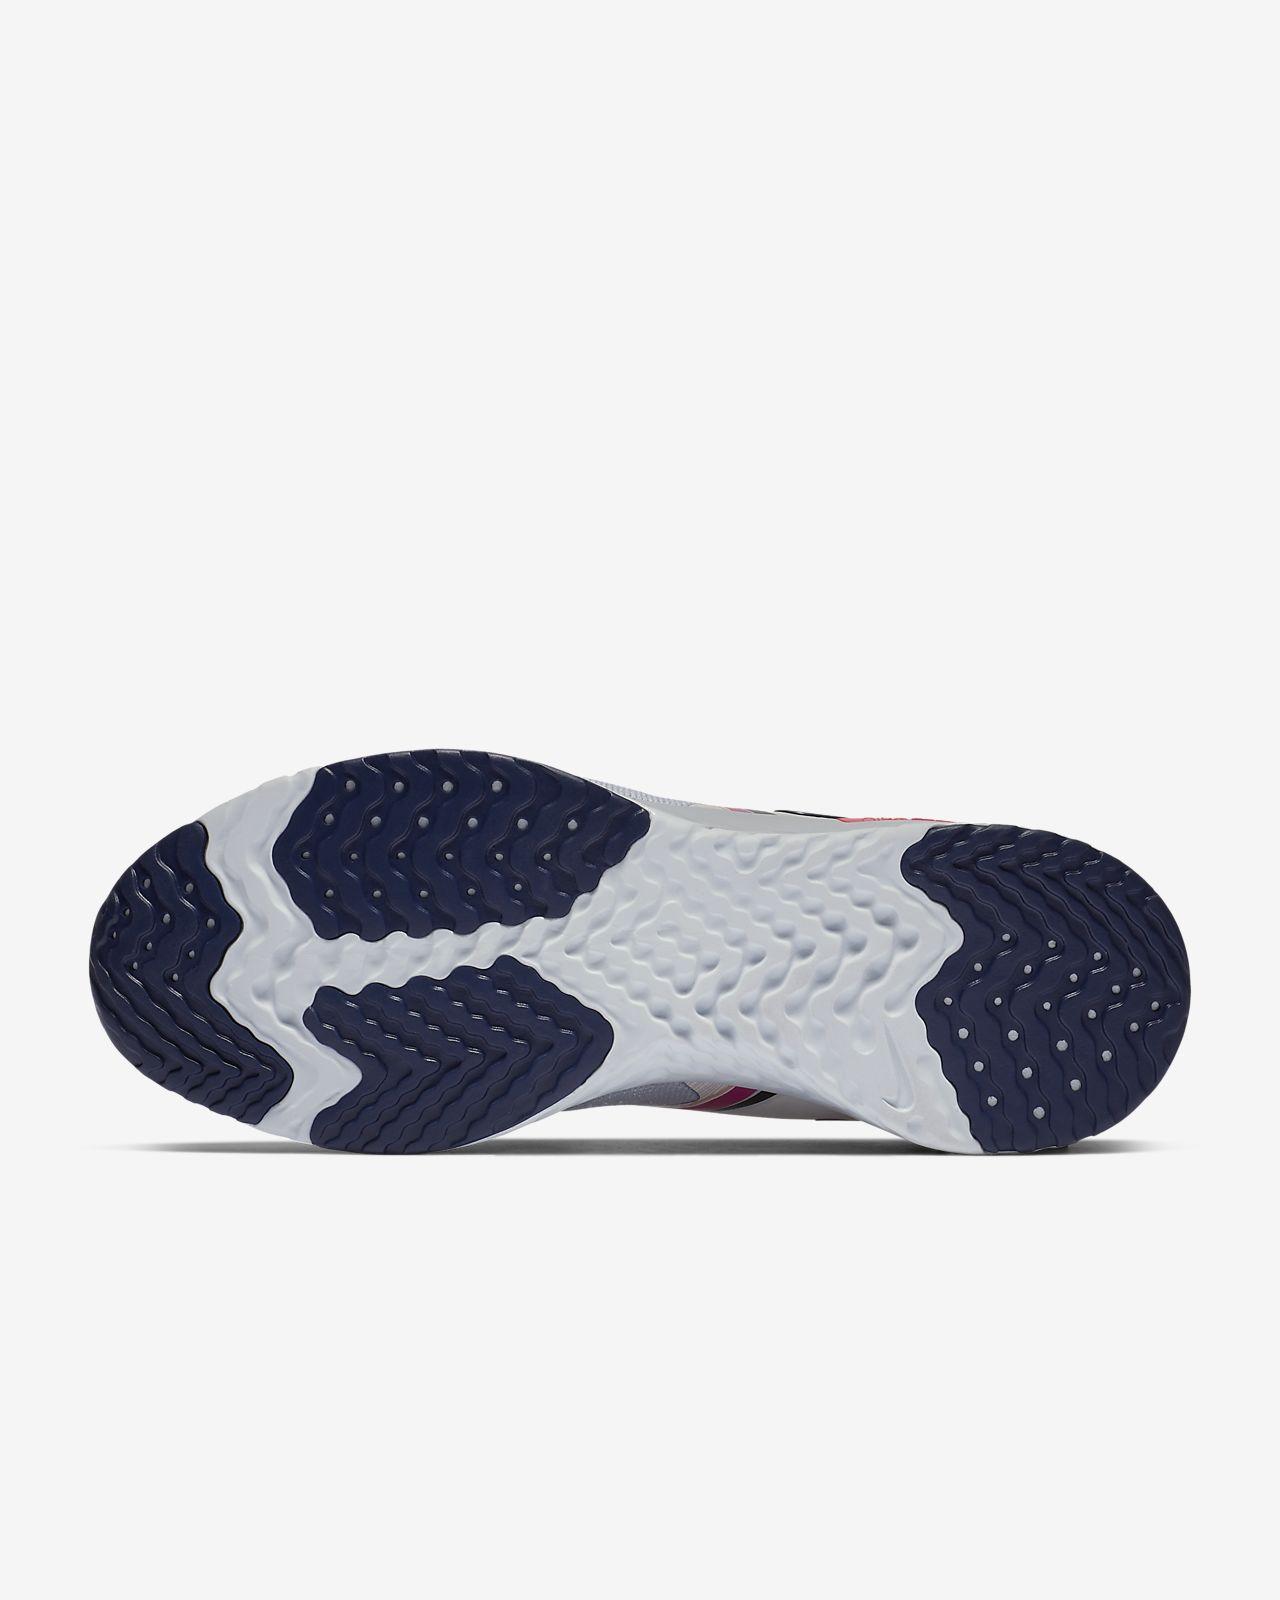 be602fda83c http://entitle.kermancinema.com/crab/vxiti-Nike_Running_amp ...